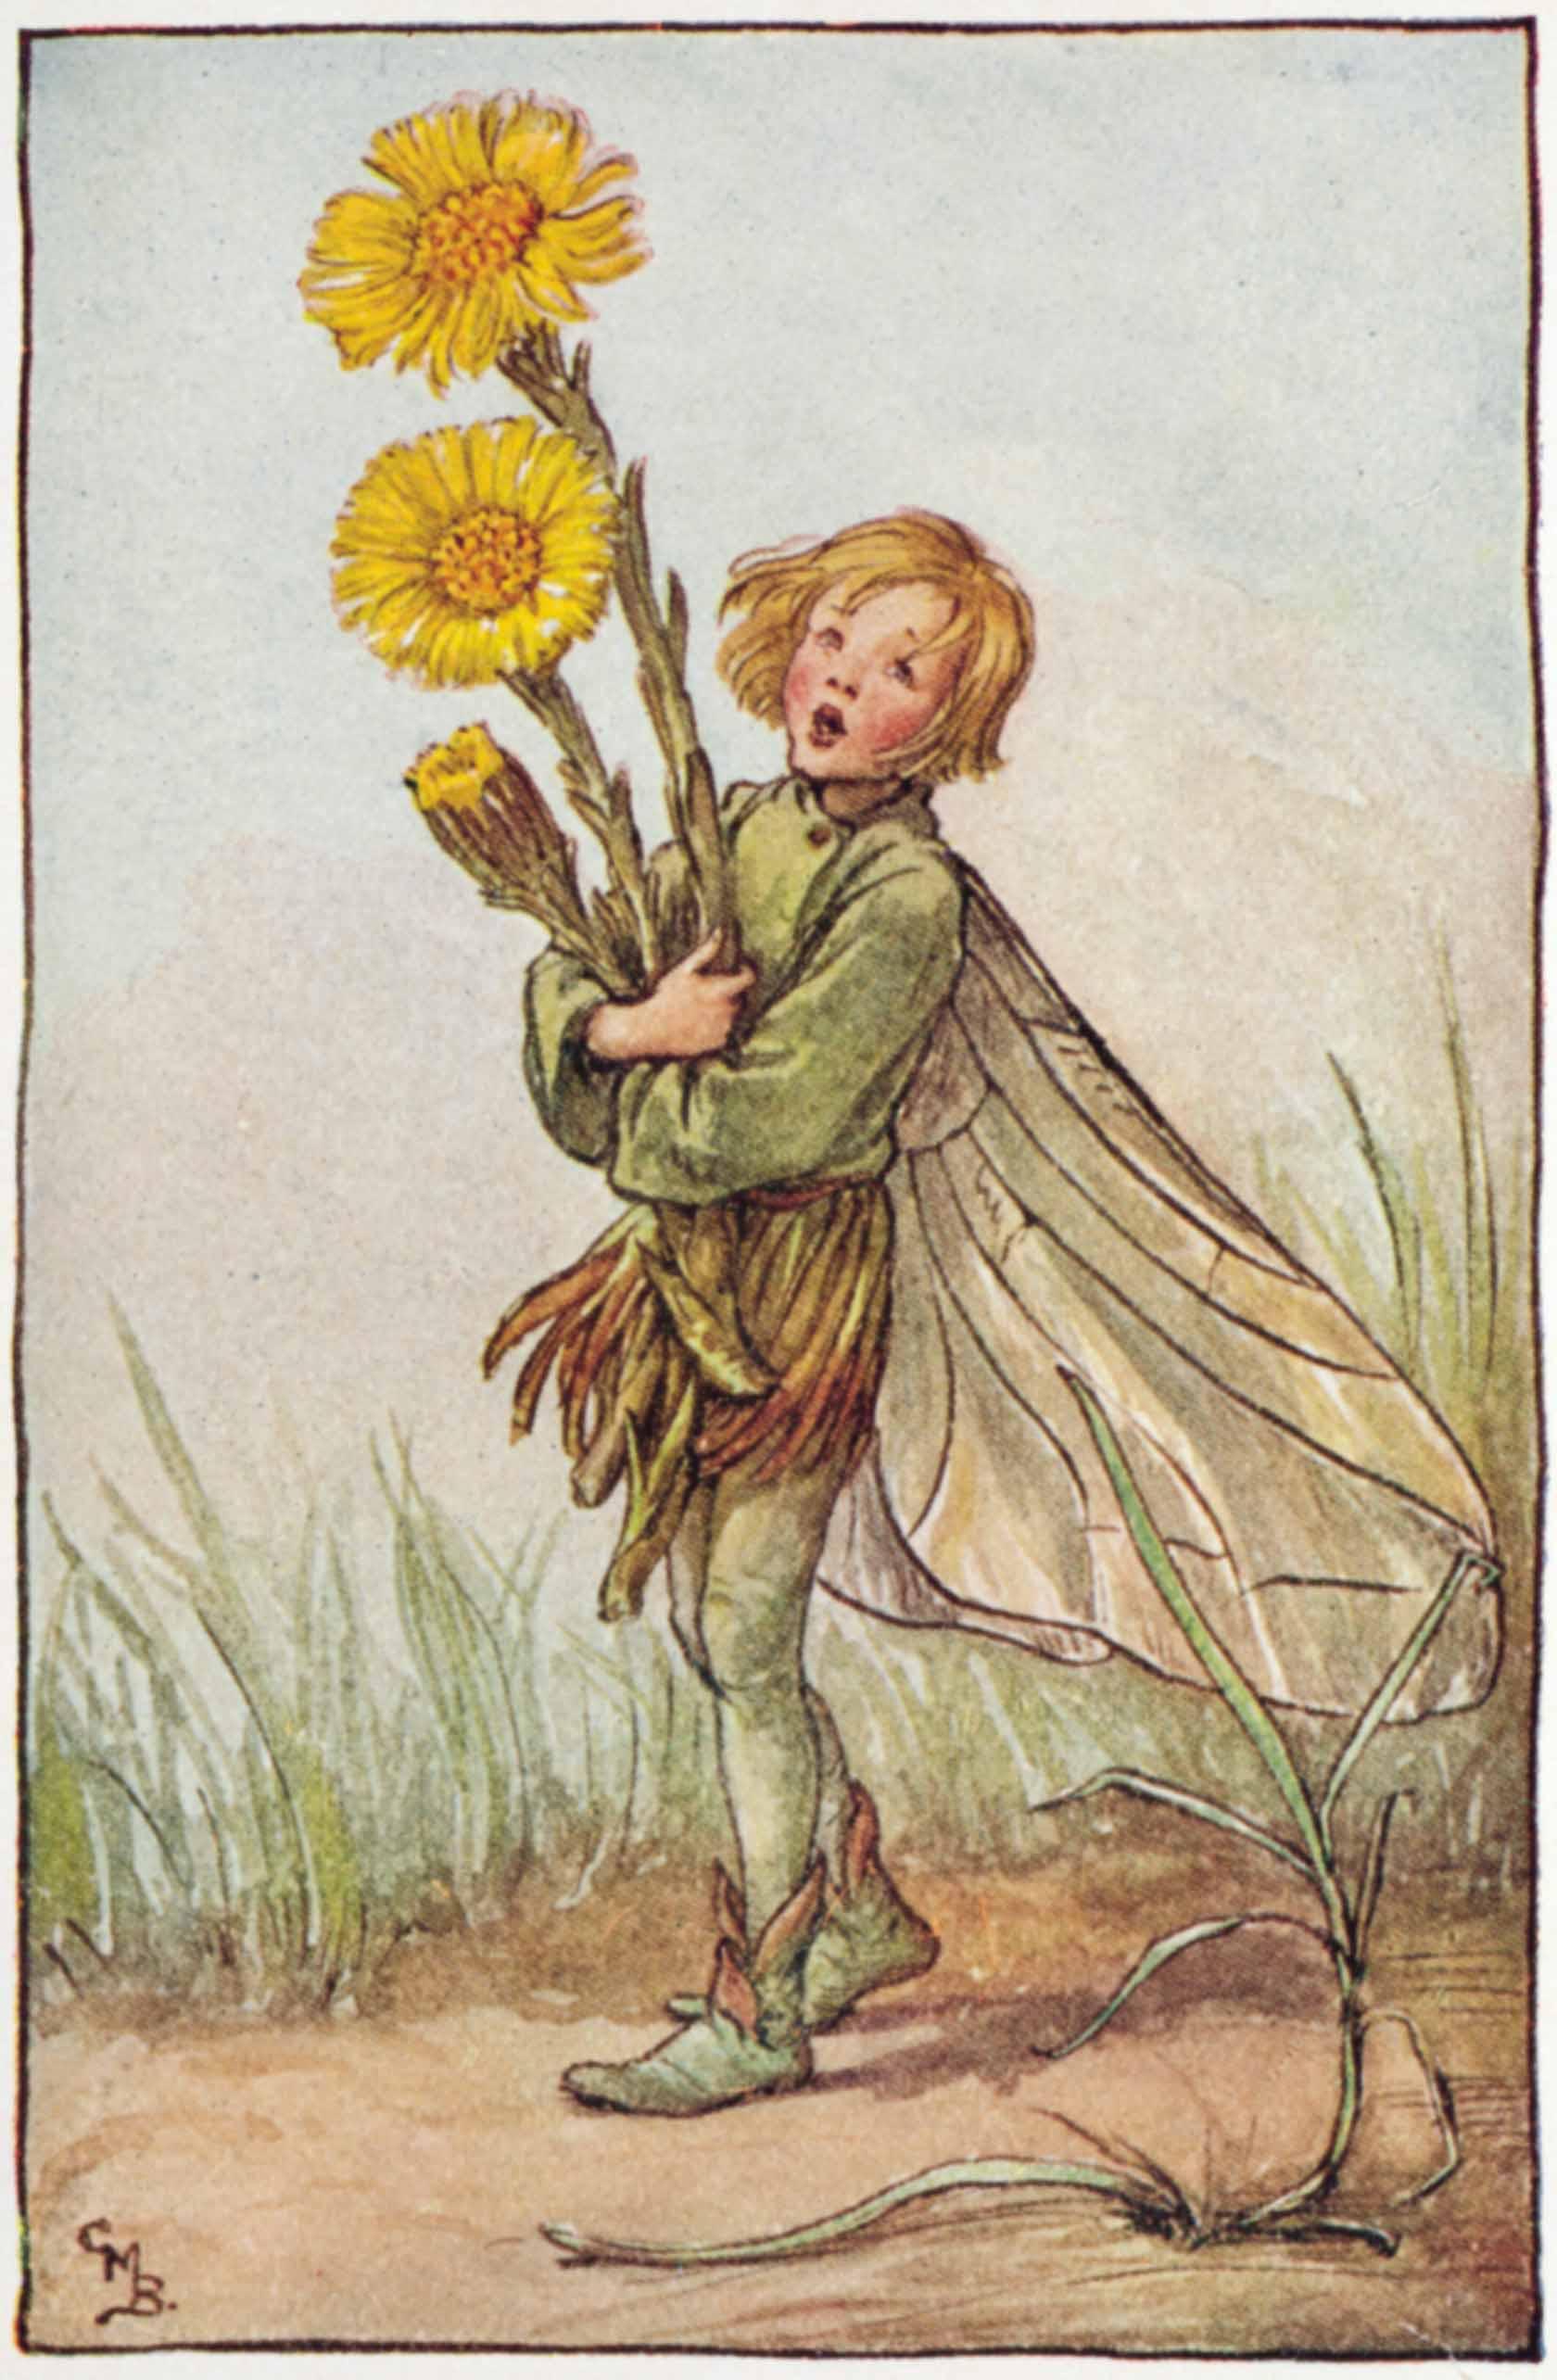 Colt's Foot Flower Fairies